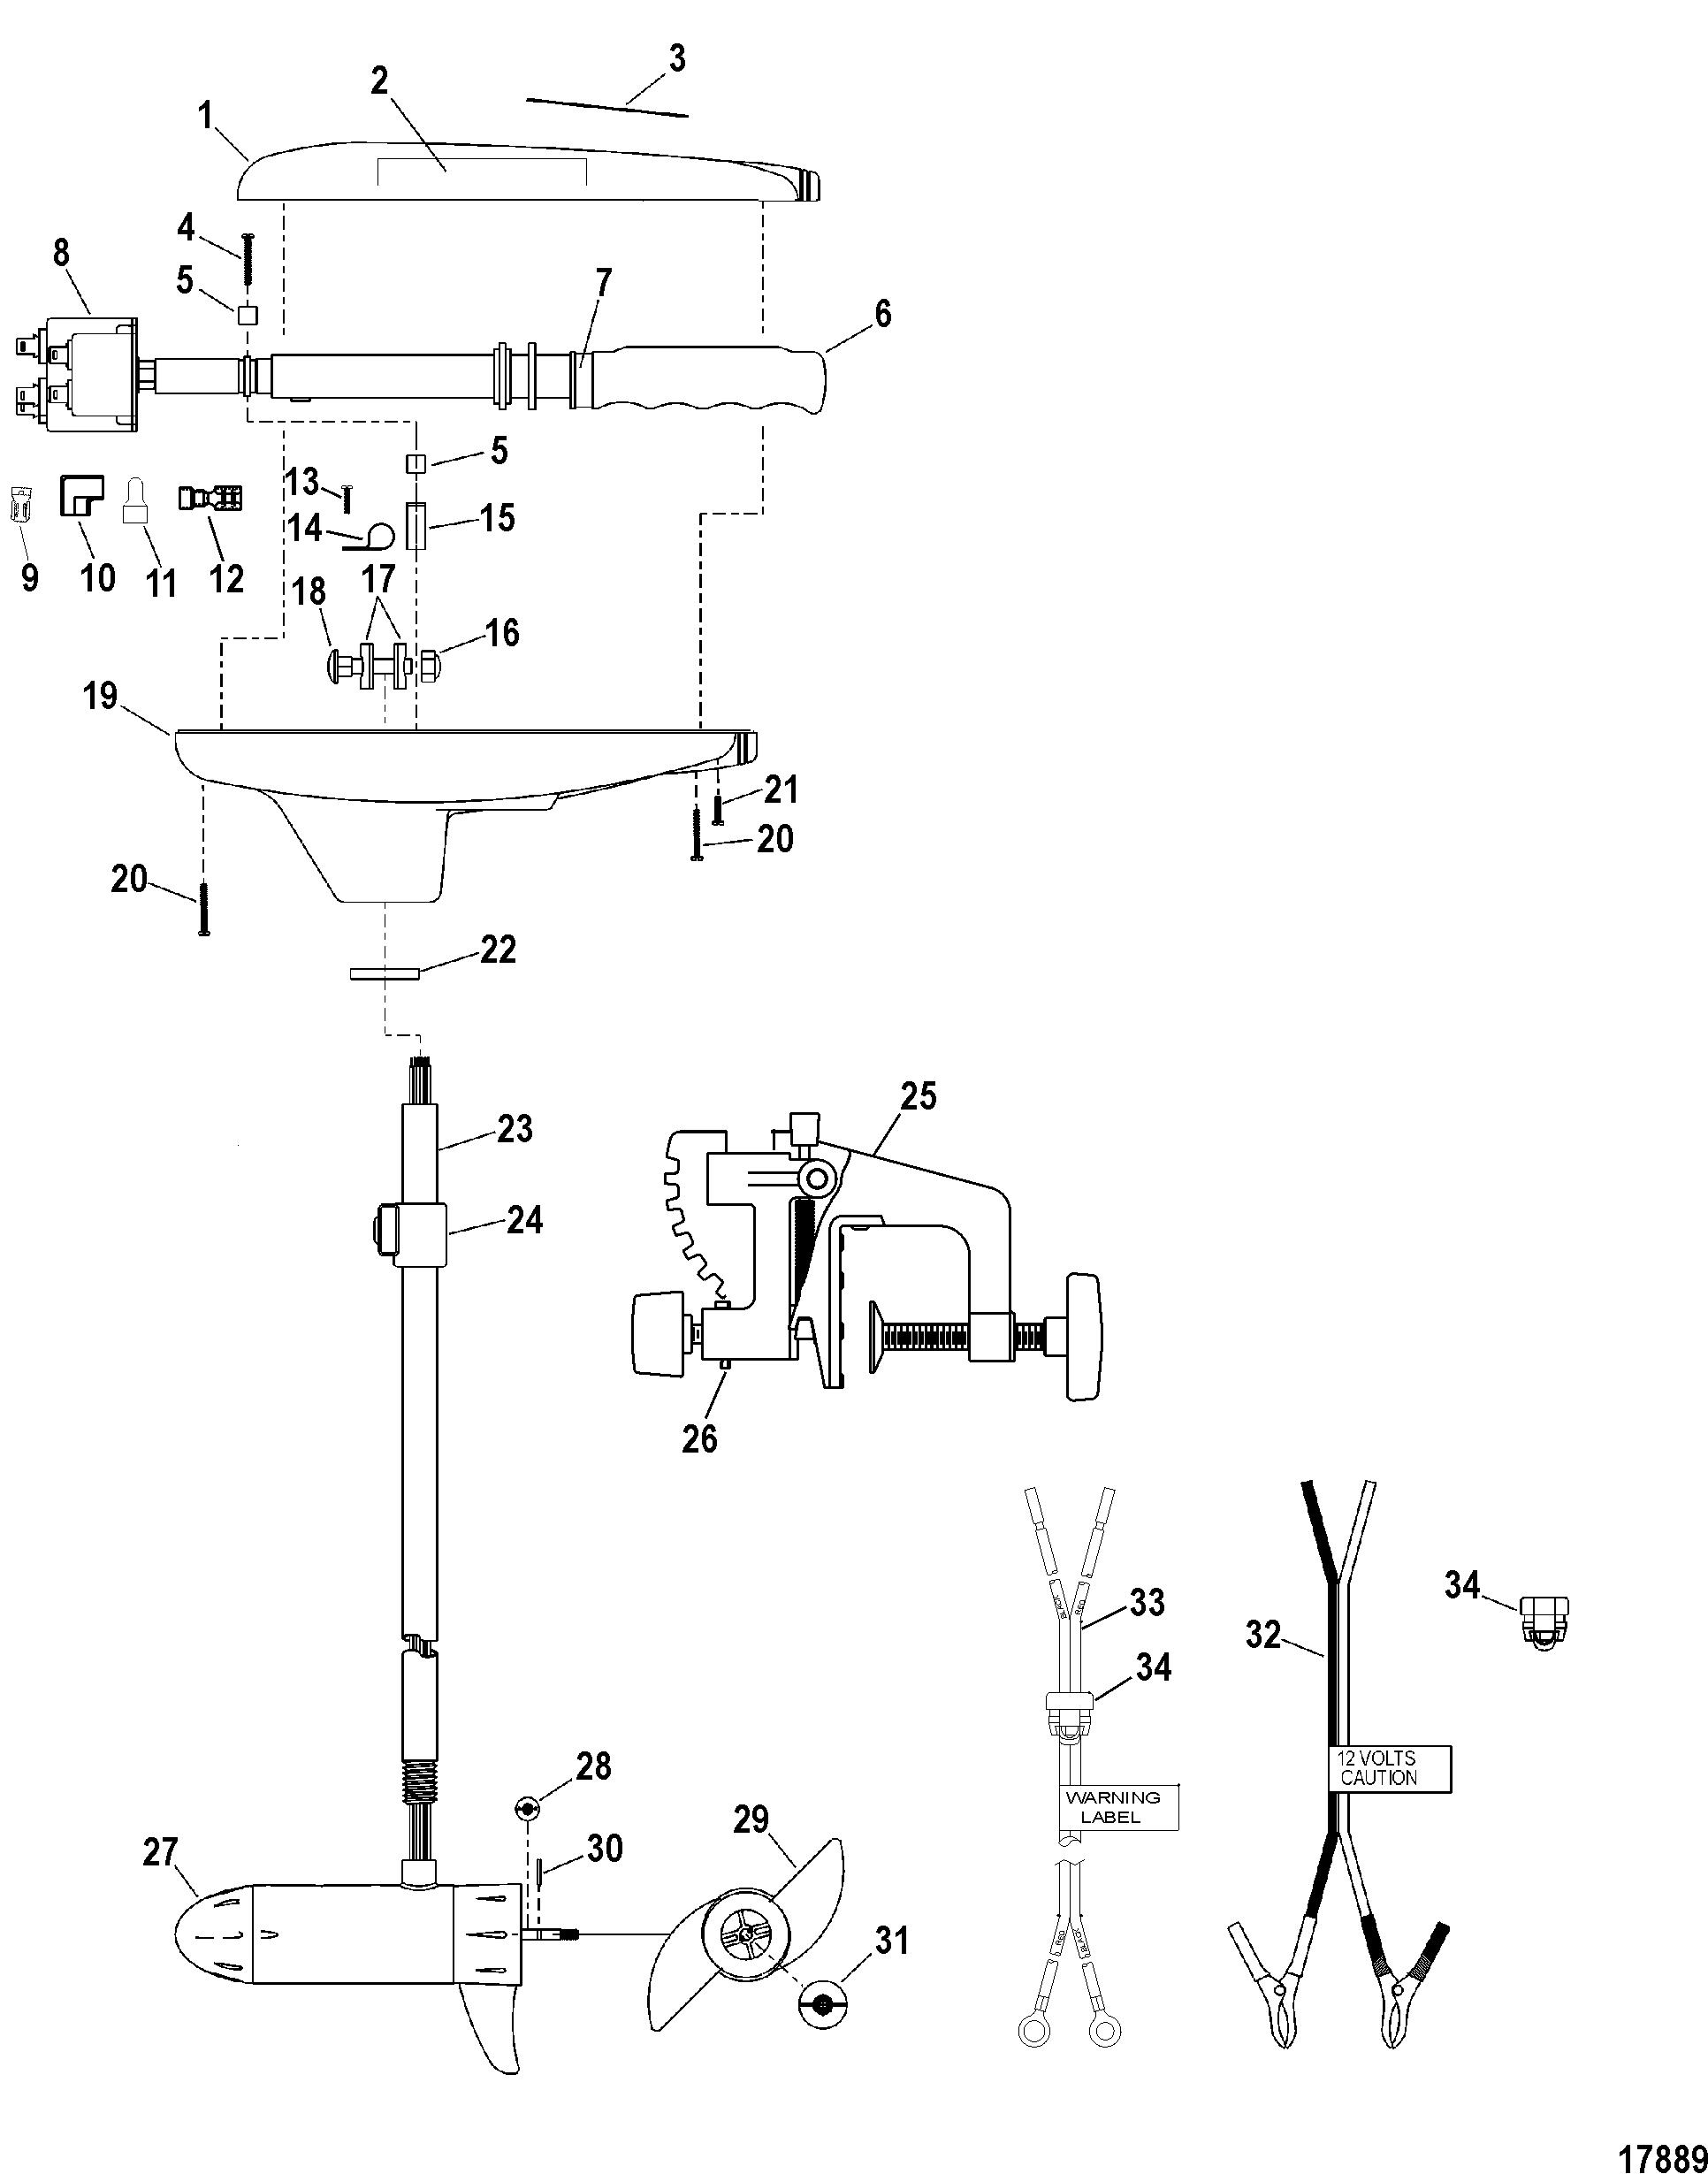 16E0 Mercury Thruster Plus Wiring Diagram | Wiring ResourcesWiring Resources